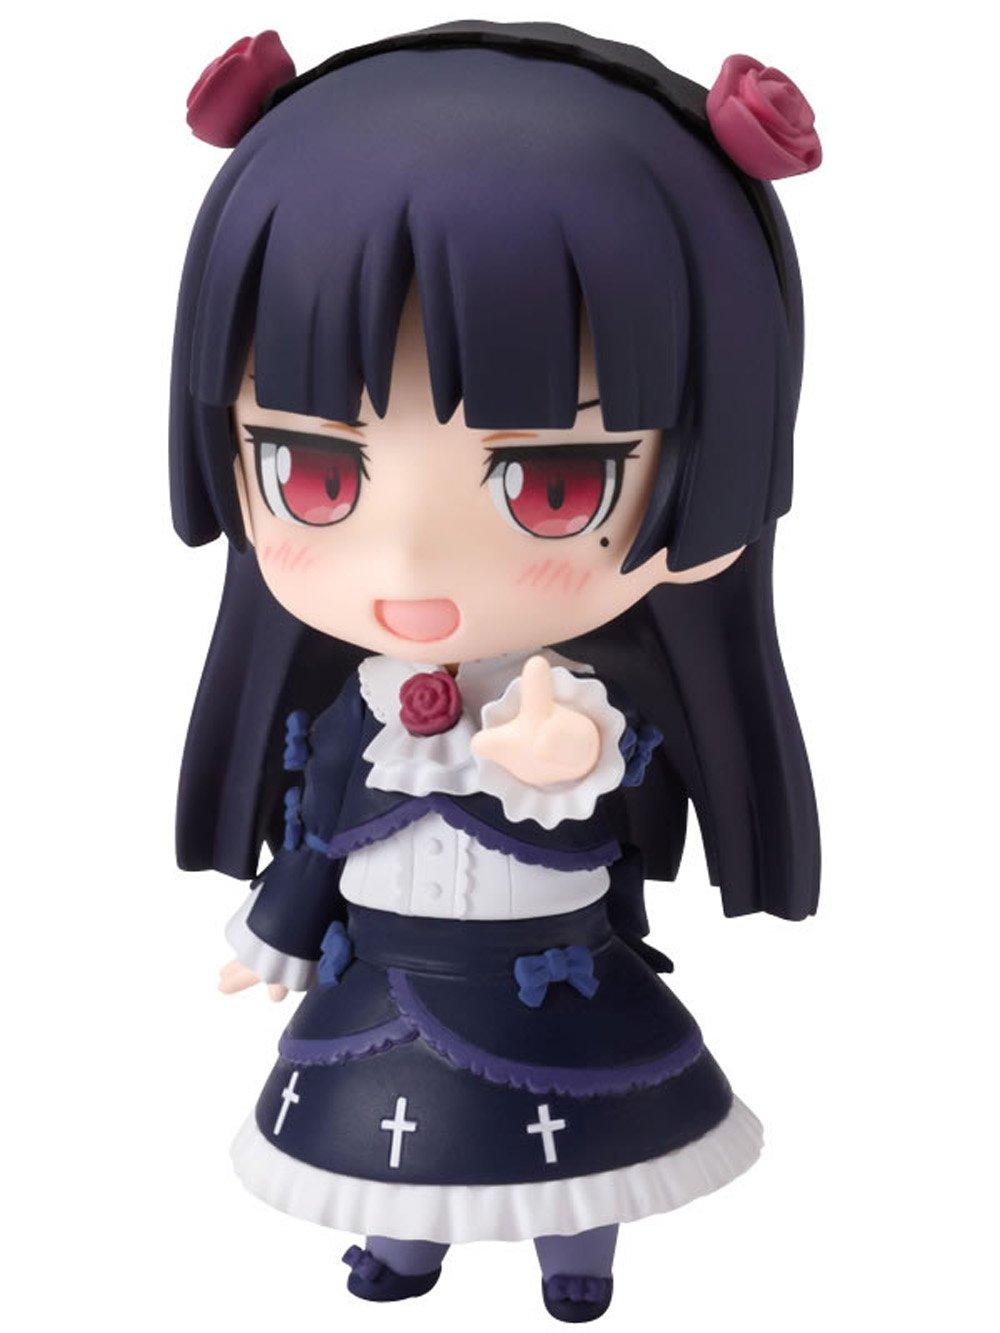 Ruri Gokou, Kuroneko Figure, Black and White Cat, Nendoroid 144, Oreimo, Good Smile Company